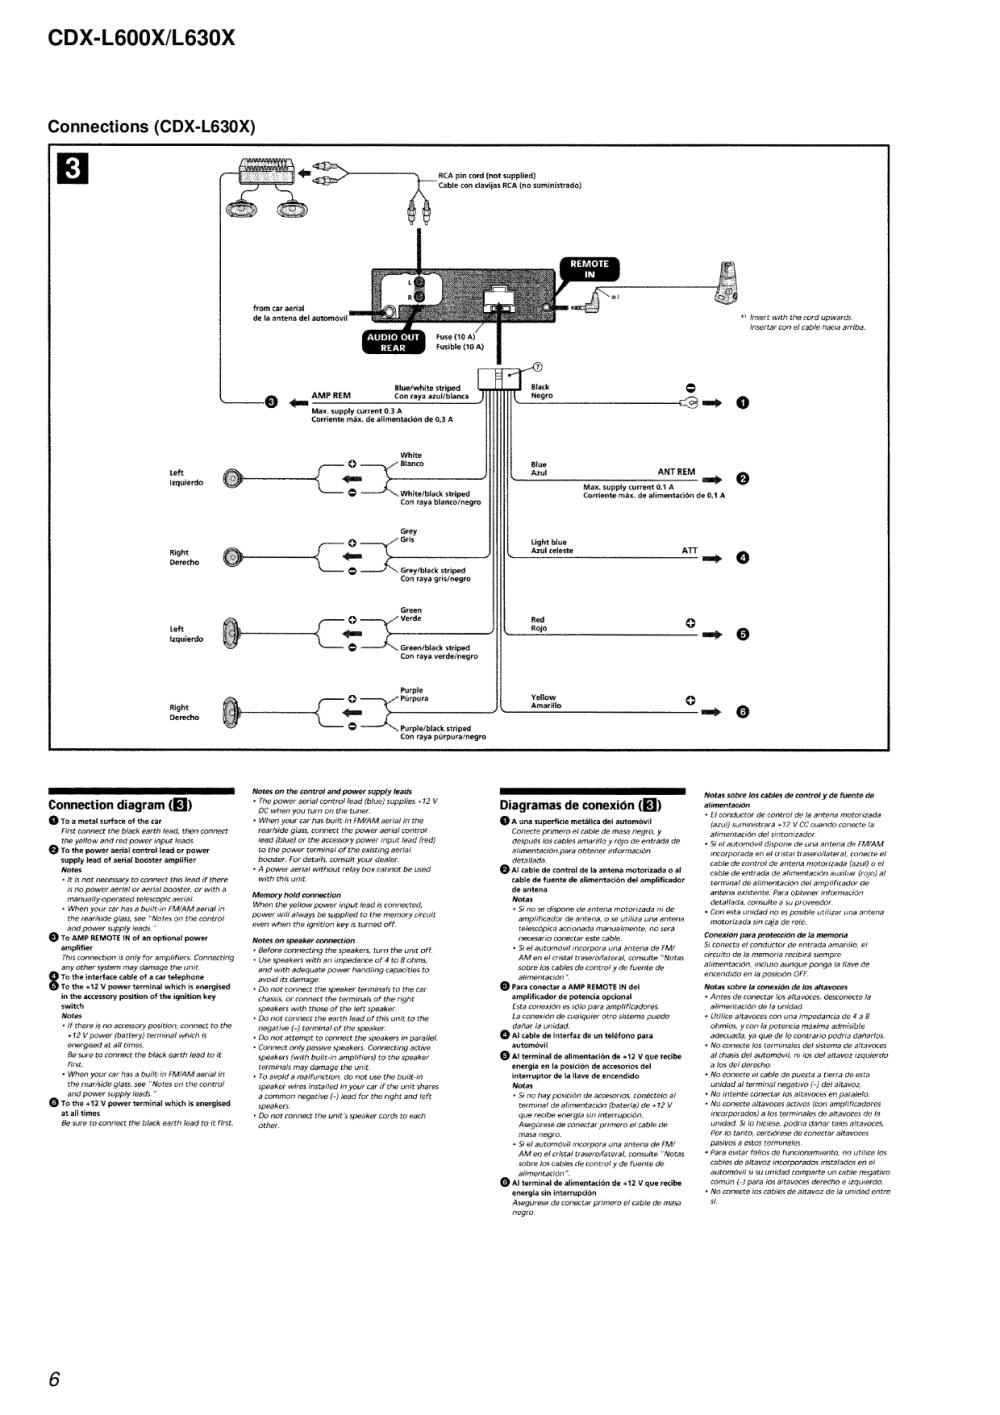 medium resolution of cdx l600x wiring diagram wiring diagram schematicpdf manual for sony car receiver cdx l630x cdx l600x